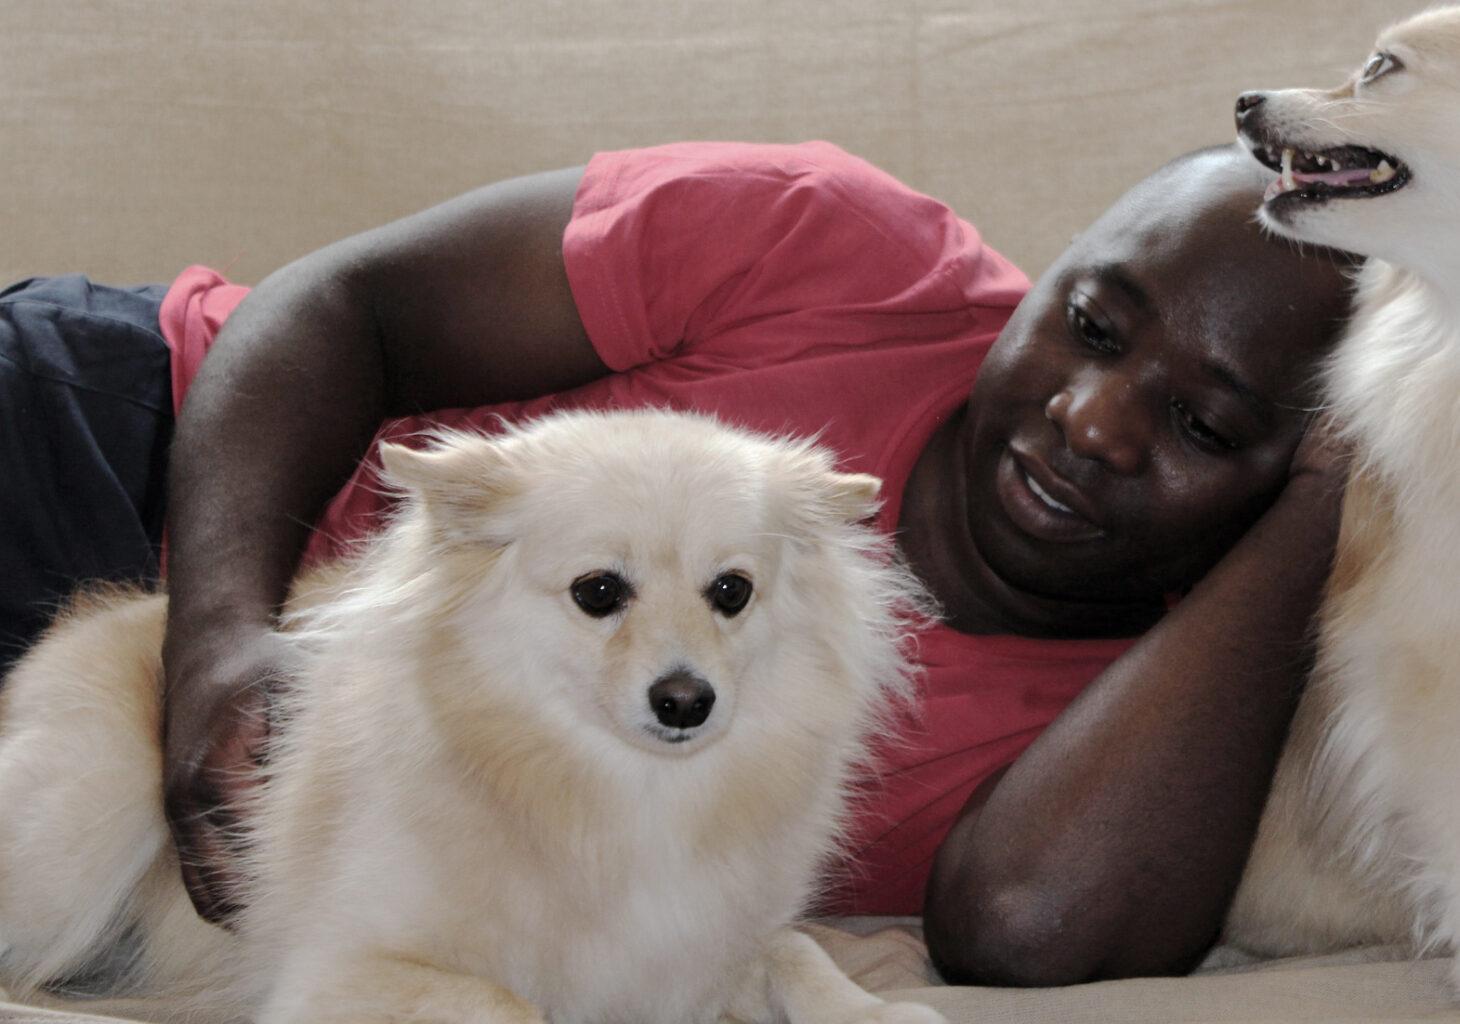 man-and-companion-dogs